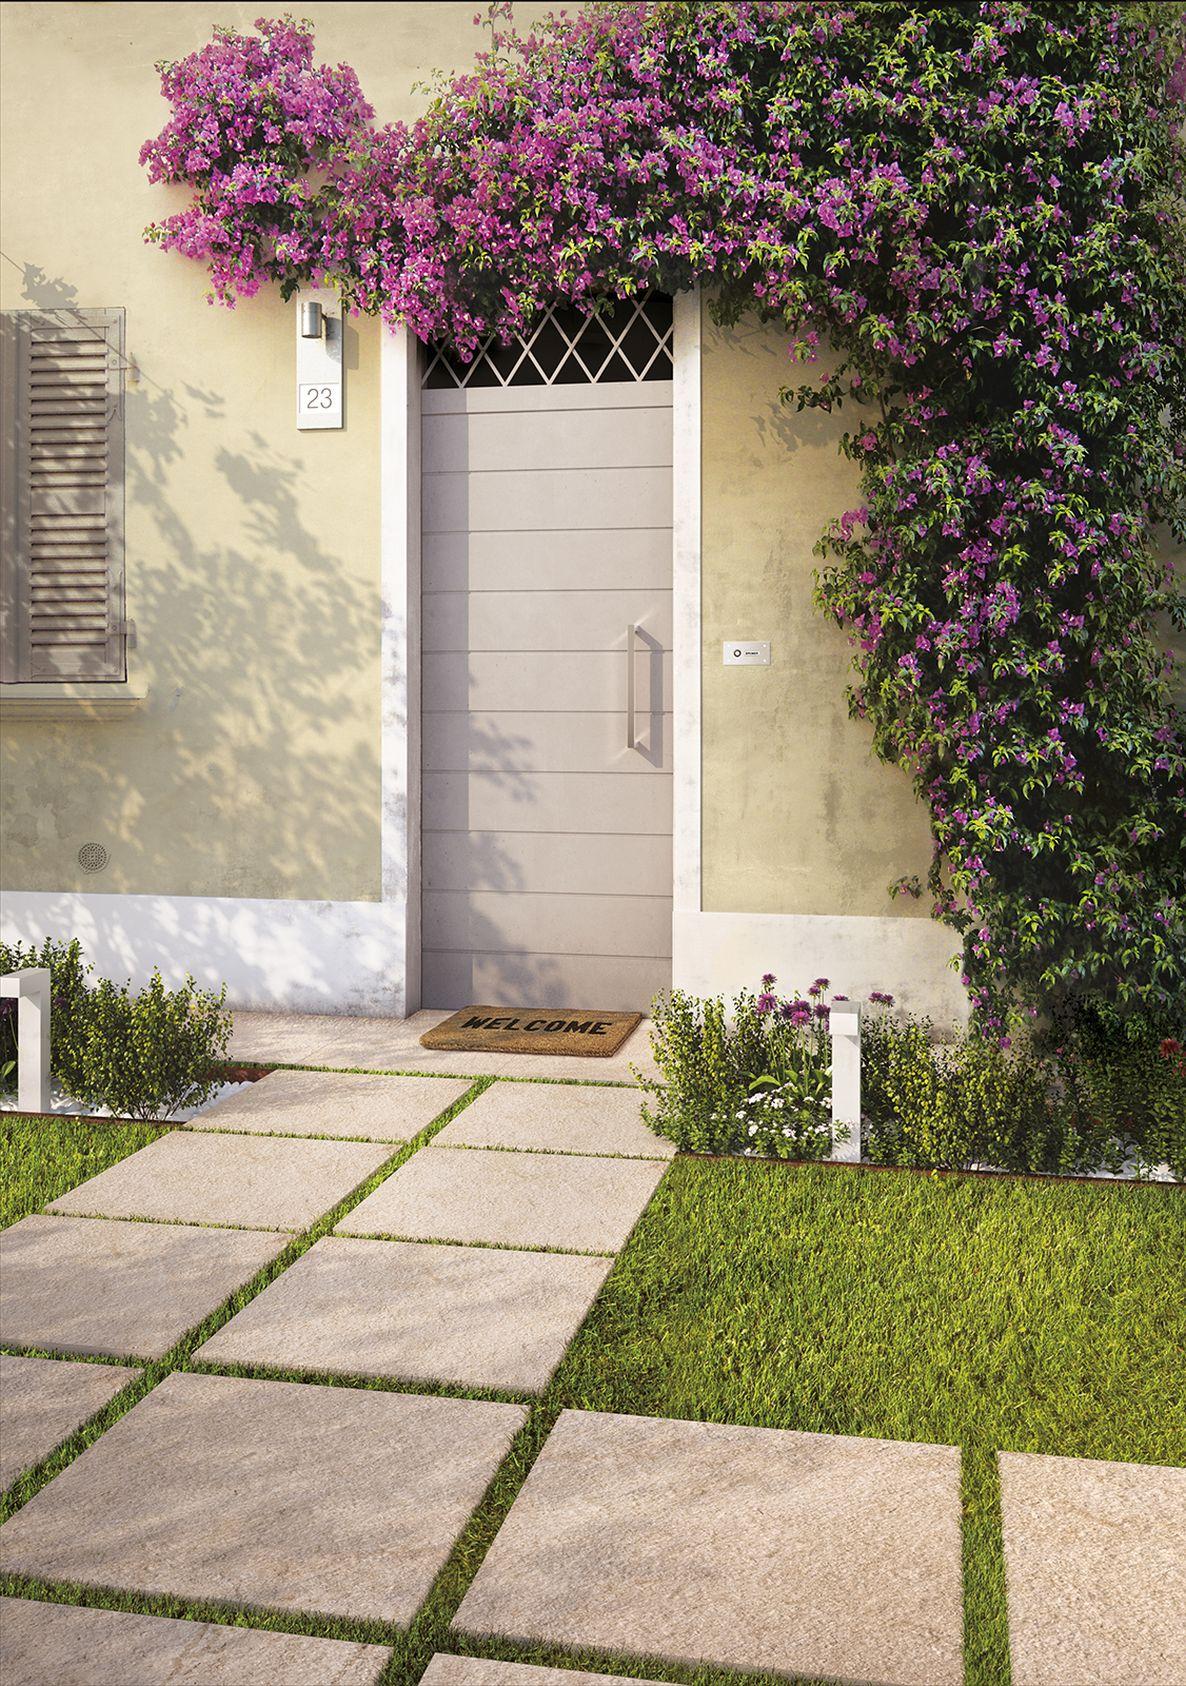 Multiquartz20 gres porcel nico para exteriores marazzi - Gres para exteriores ...